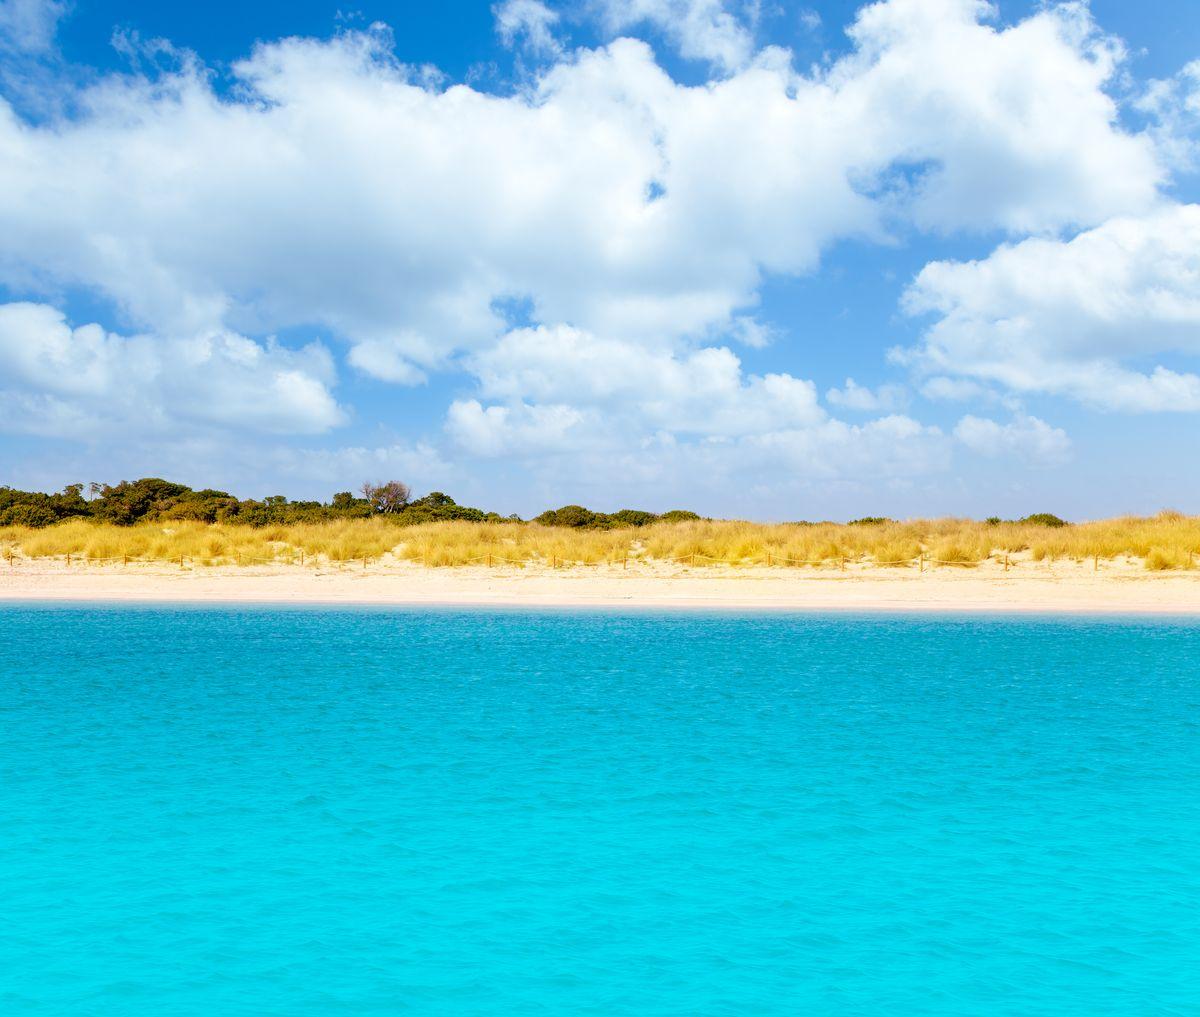 Playa S'Alga (Espalmador), Formentera, Balearics, Spain